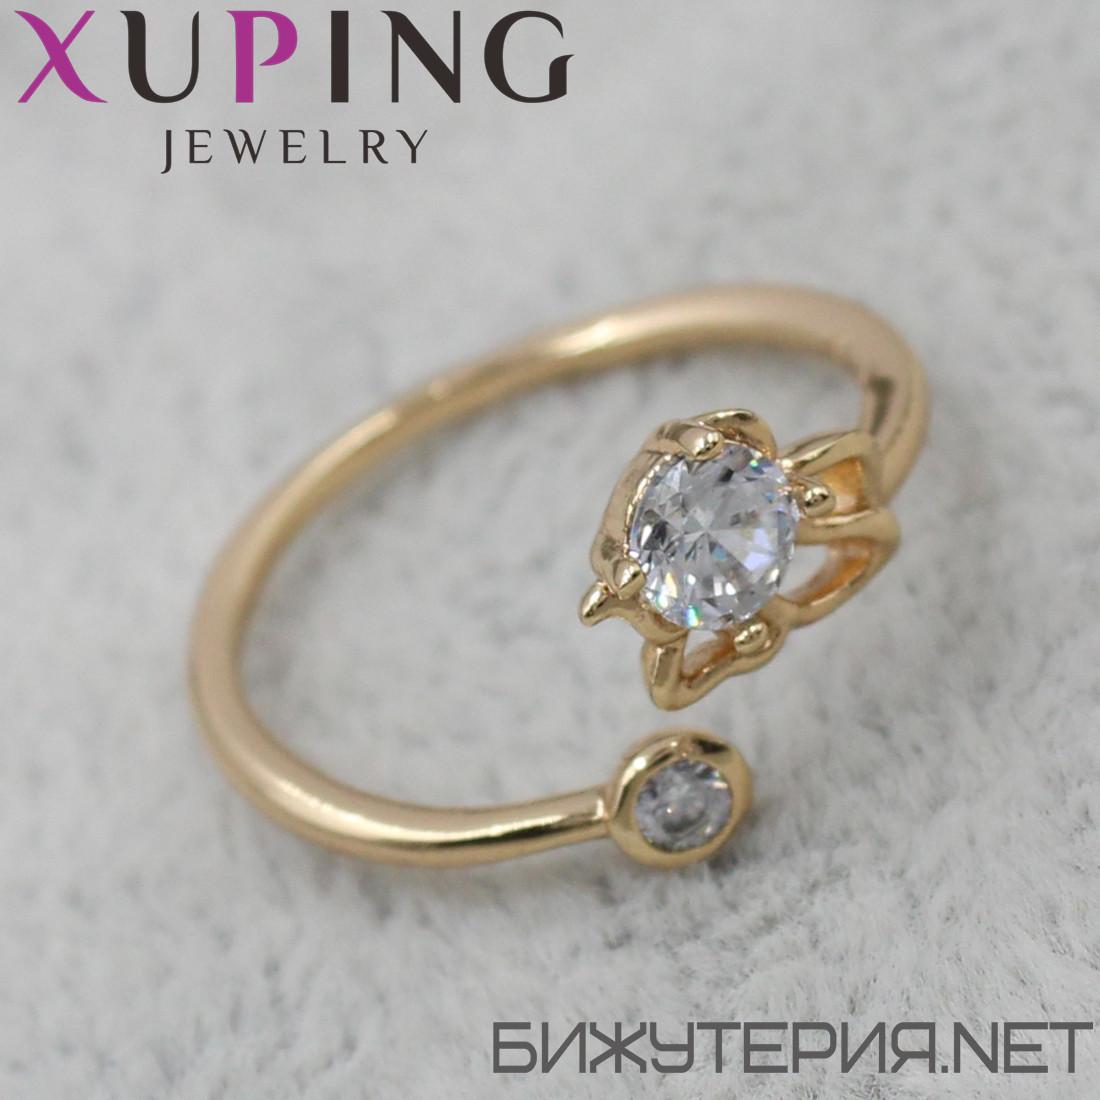 Кольцо Xuping медицинское золото 18K Gold - 1027629042